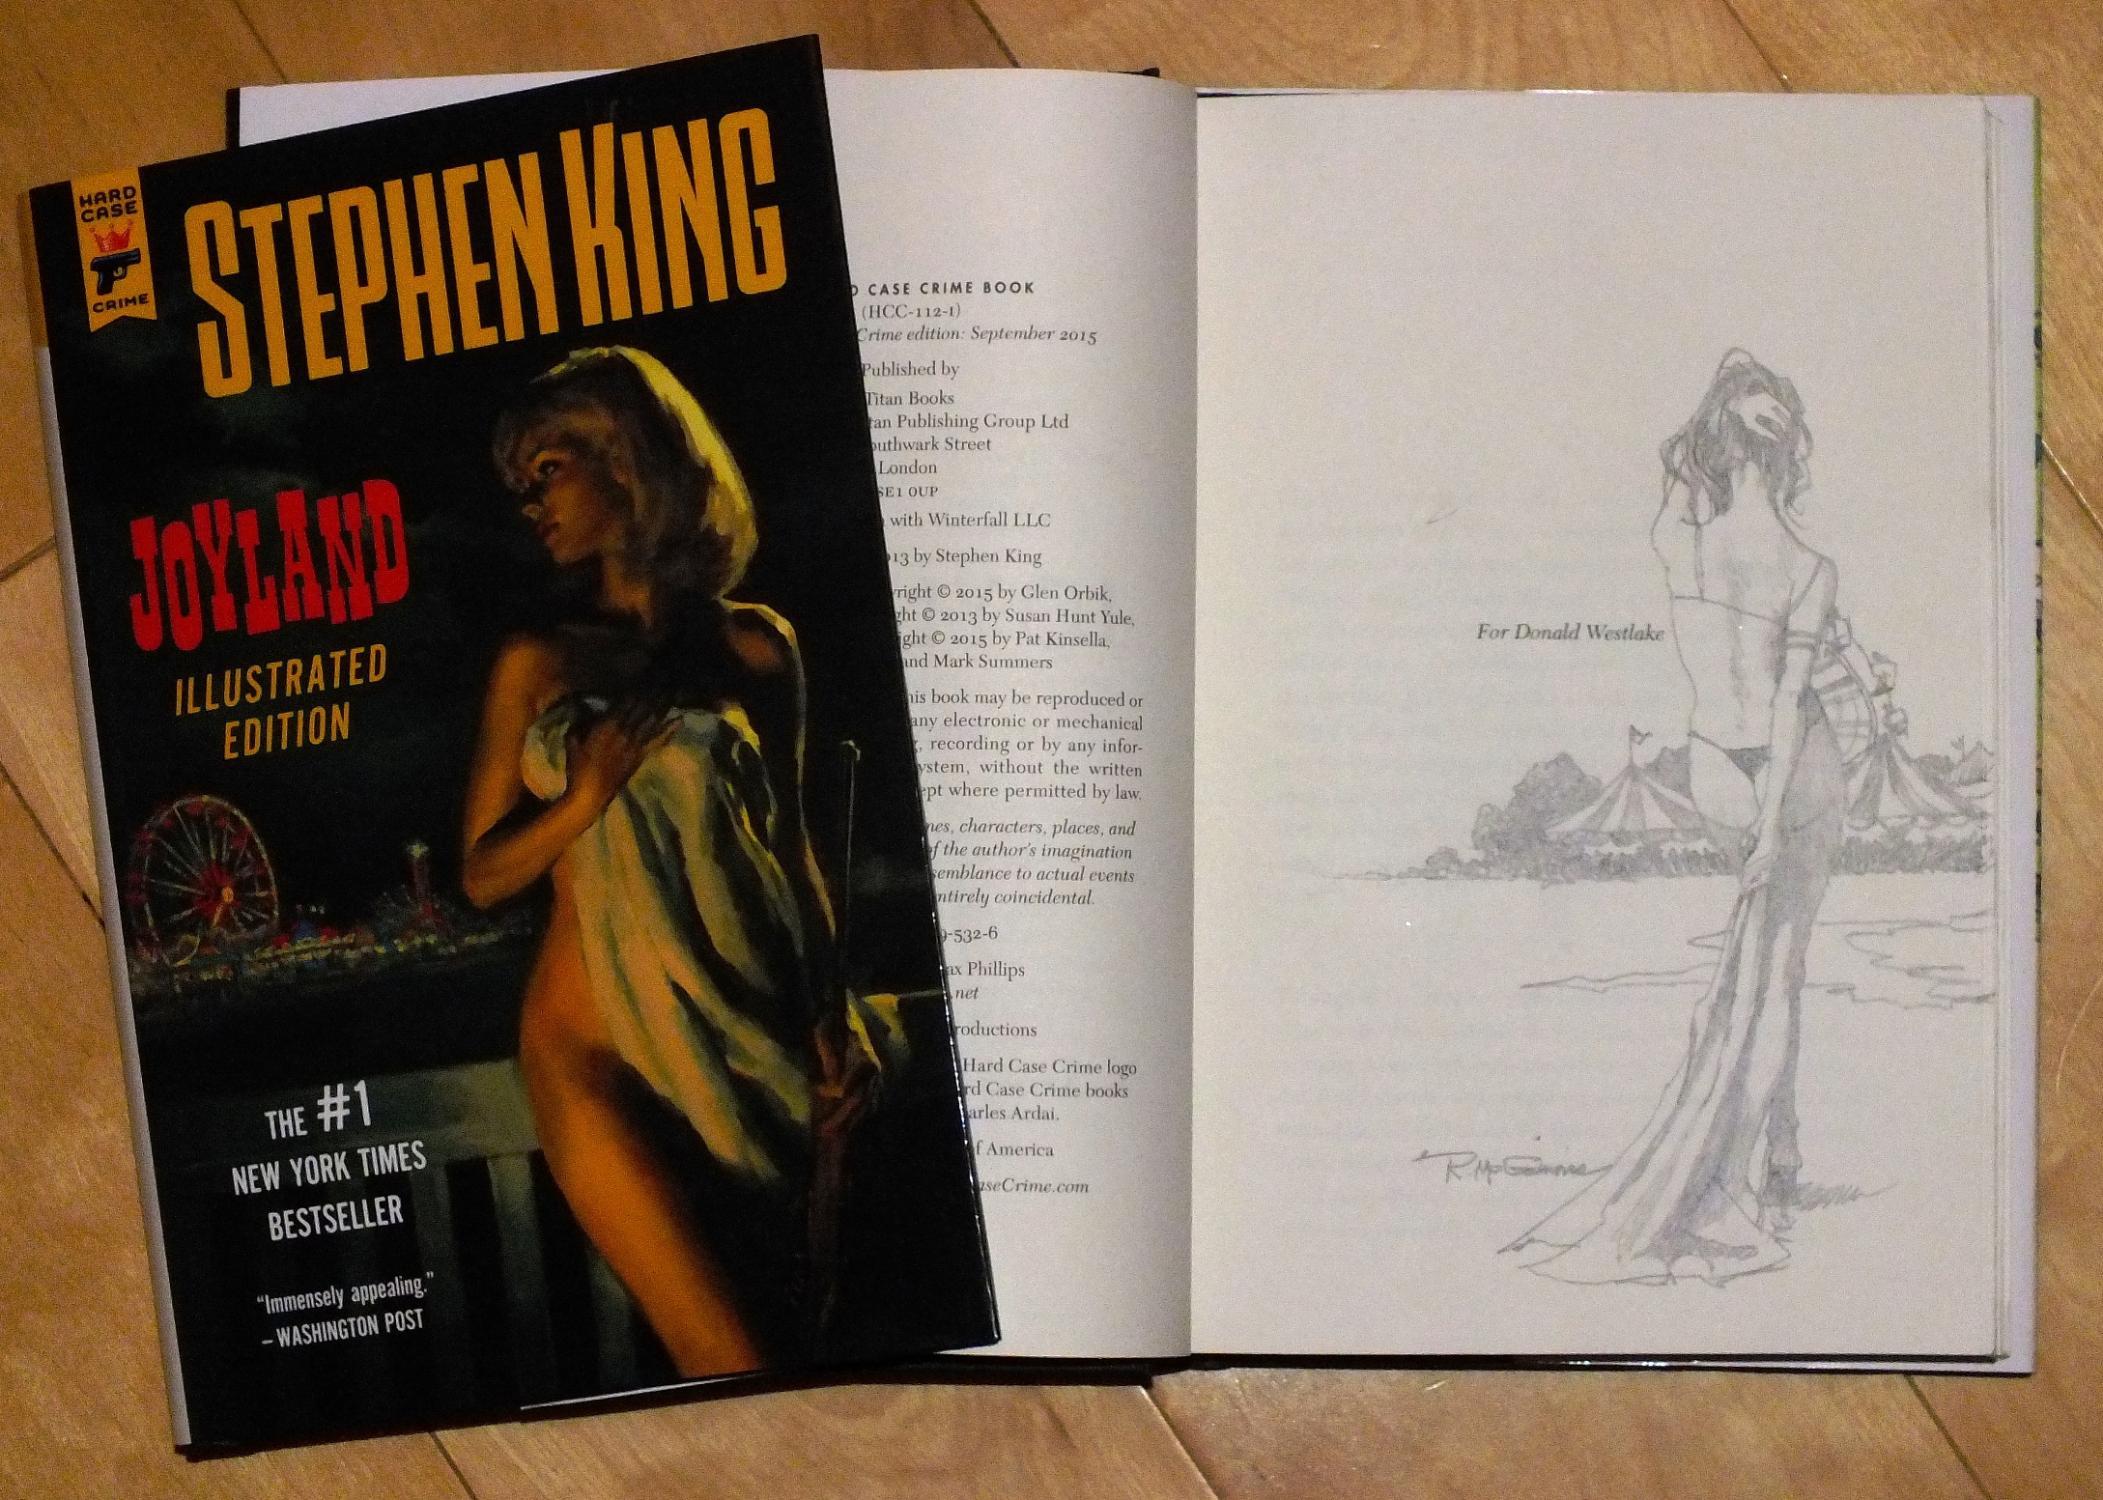 Joyland (illustrated edition) artist-signed remarqued 1st edition: Stephen King